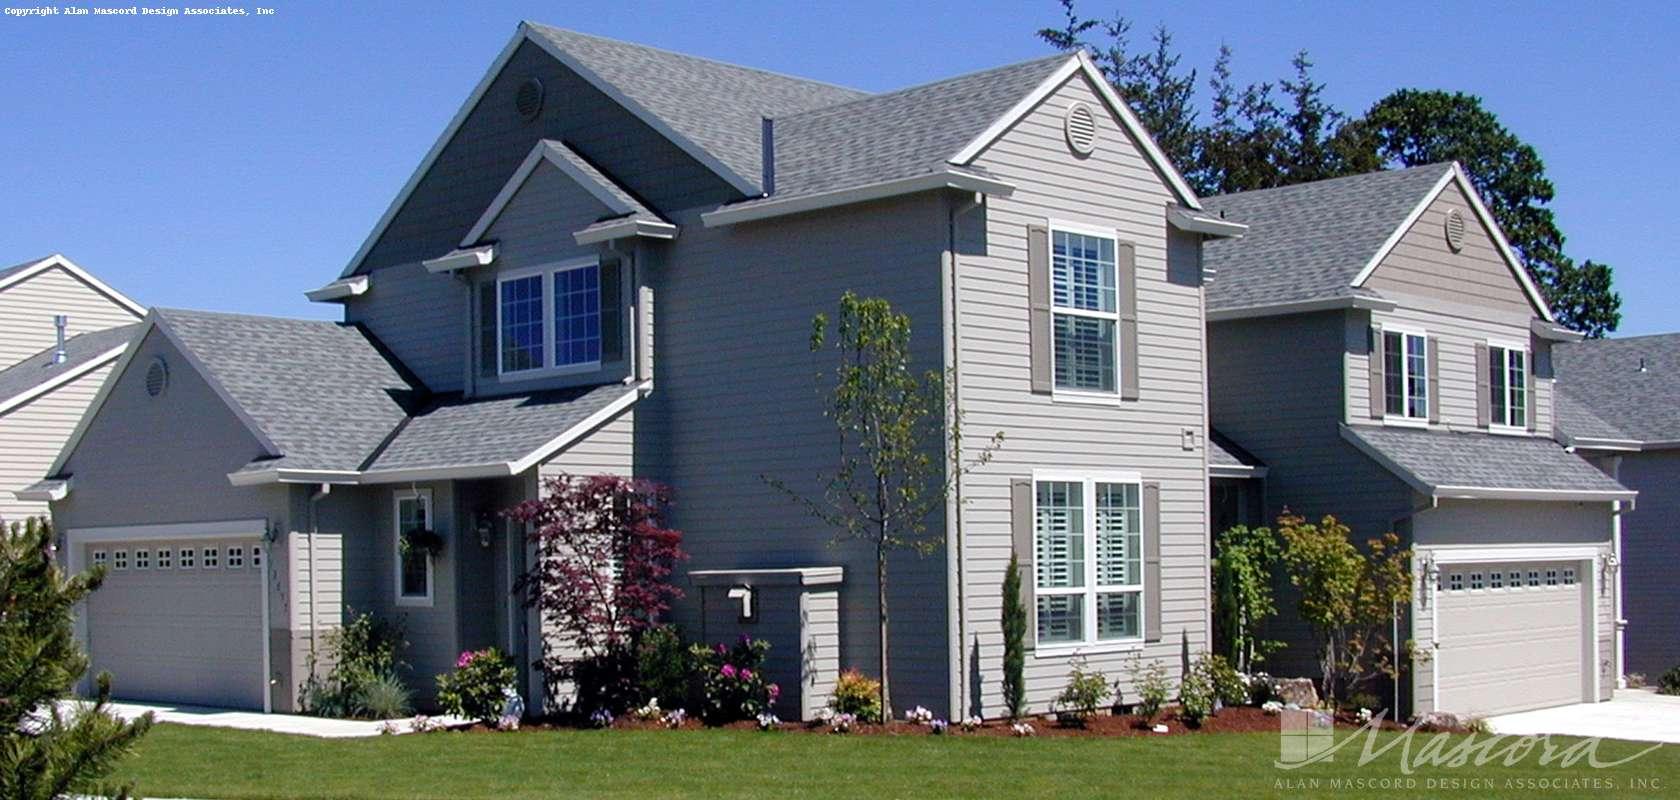 Mascord House Plan 4012: The Edgeworth